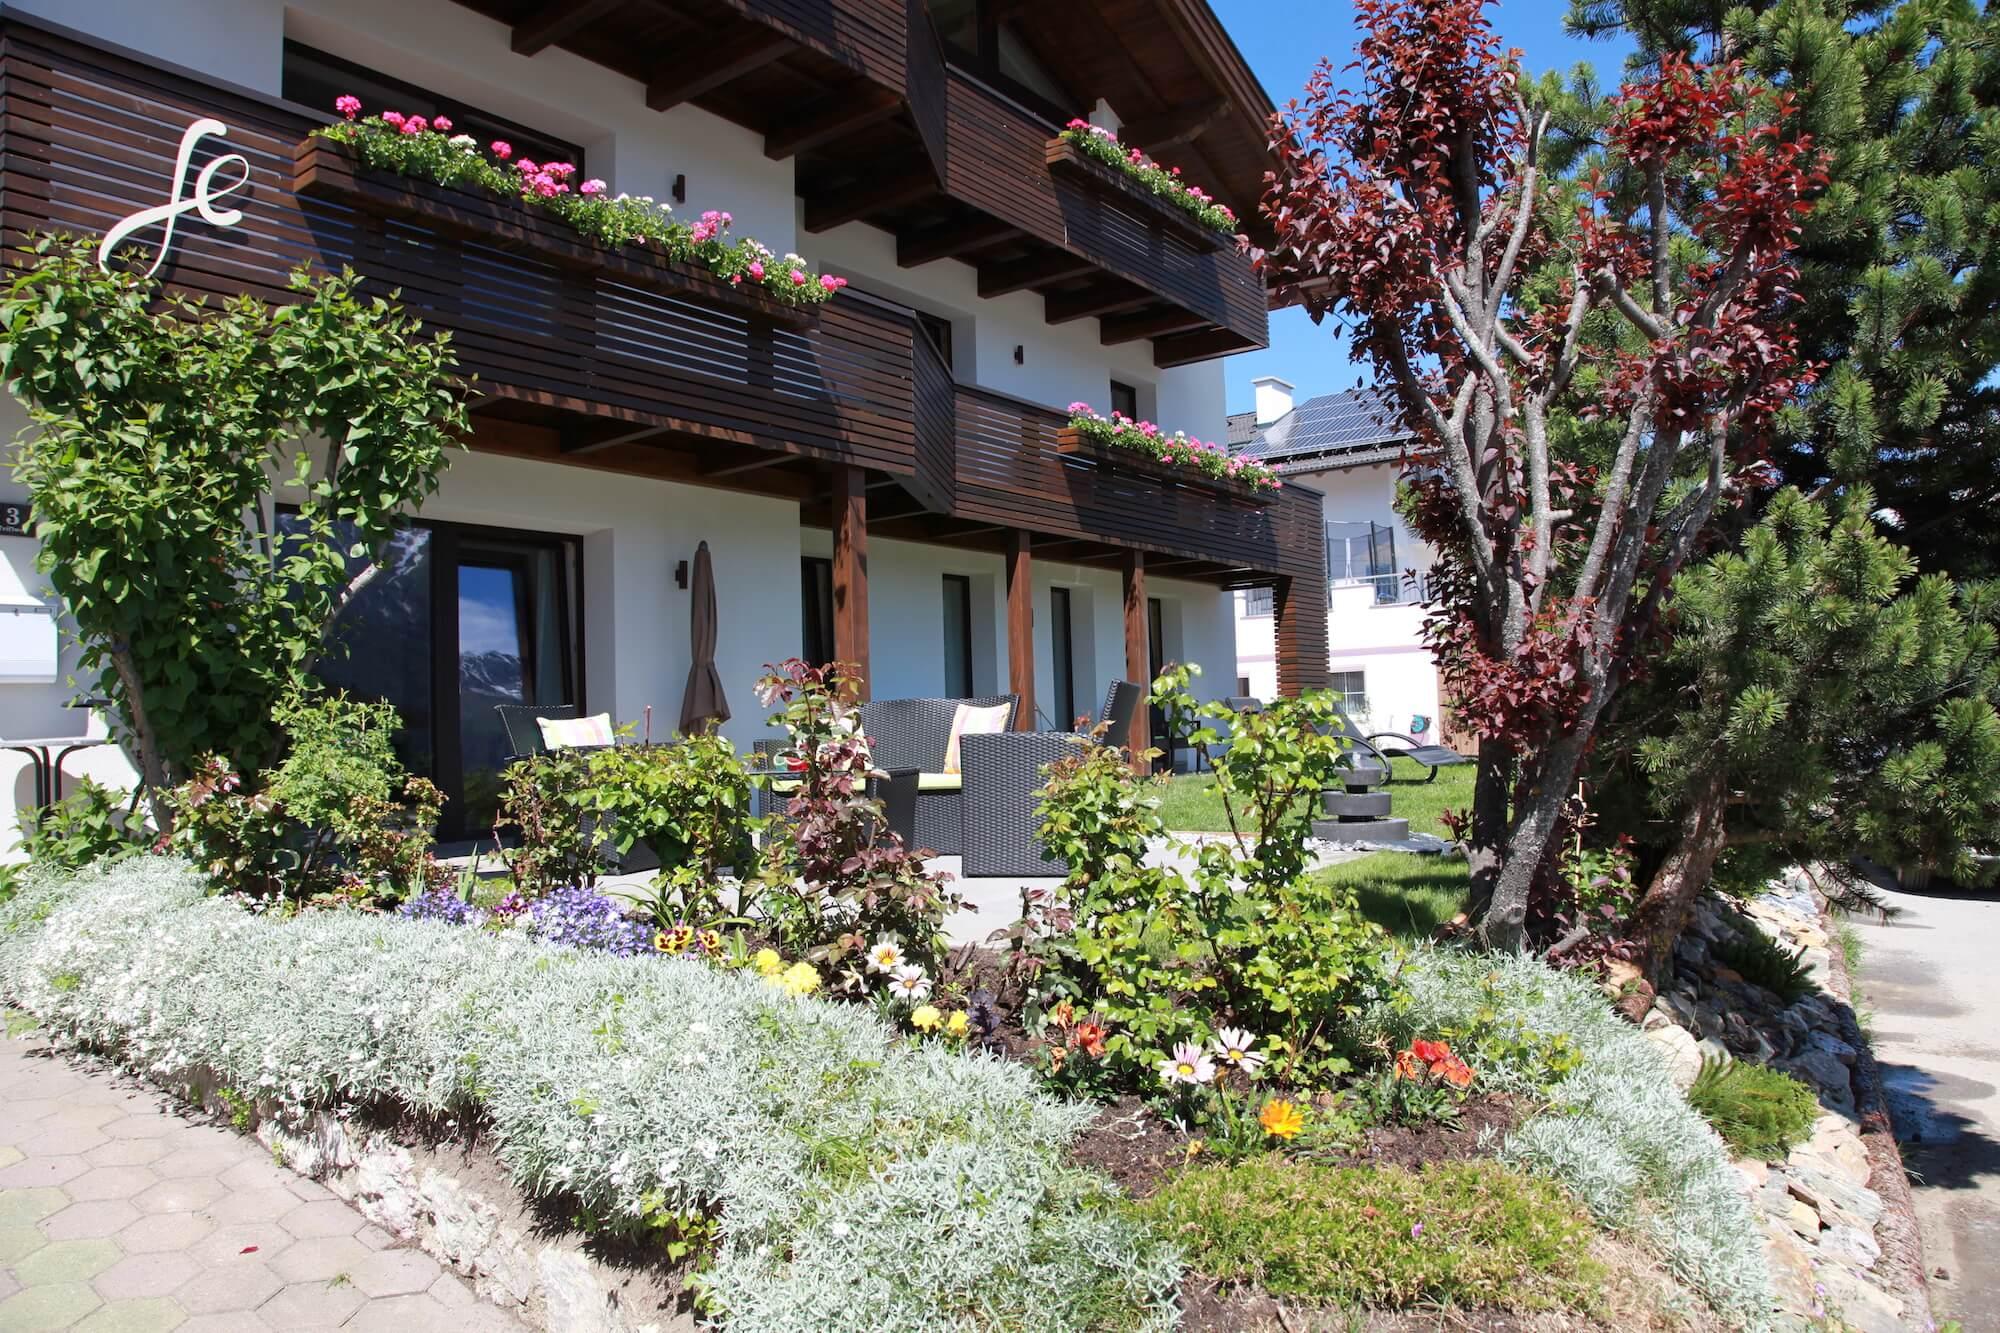 Fiss_Ferienwohnung_Garten_Grill_Sauna_Infrarot_SlowLivingSuite_Schmiderer_9.jpg